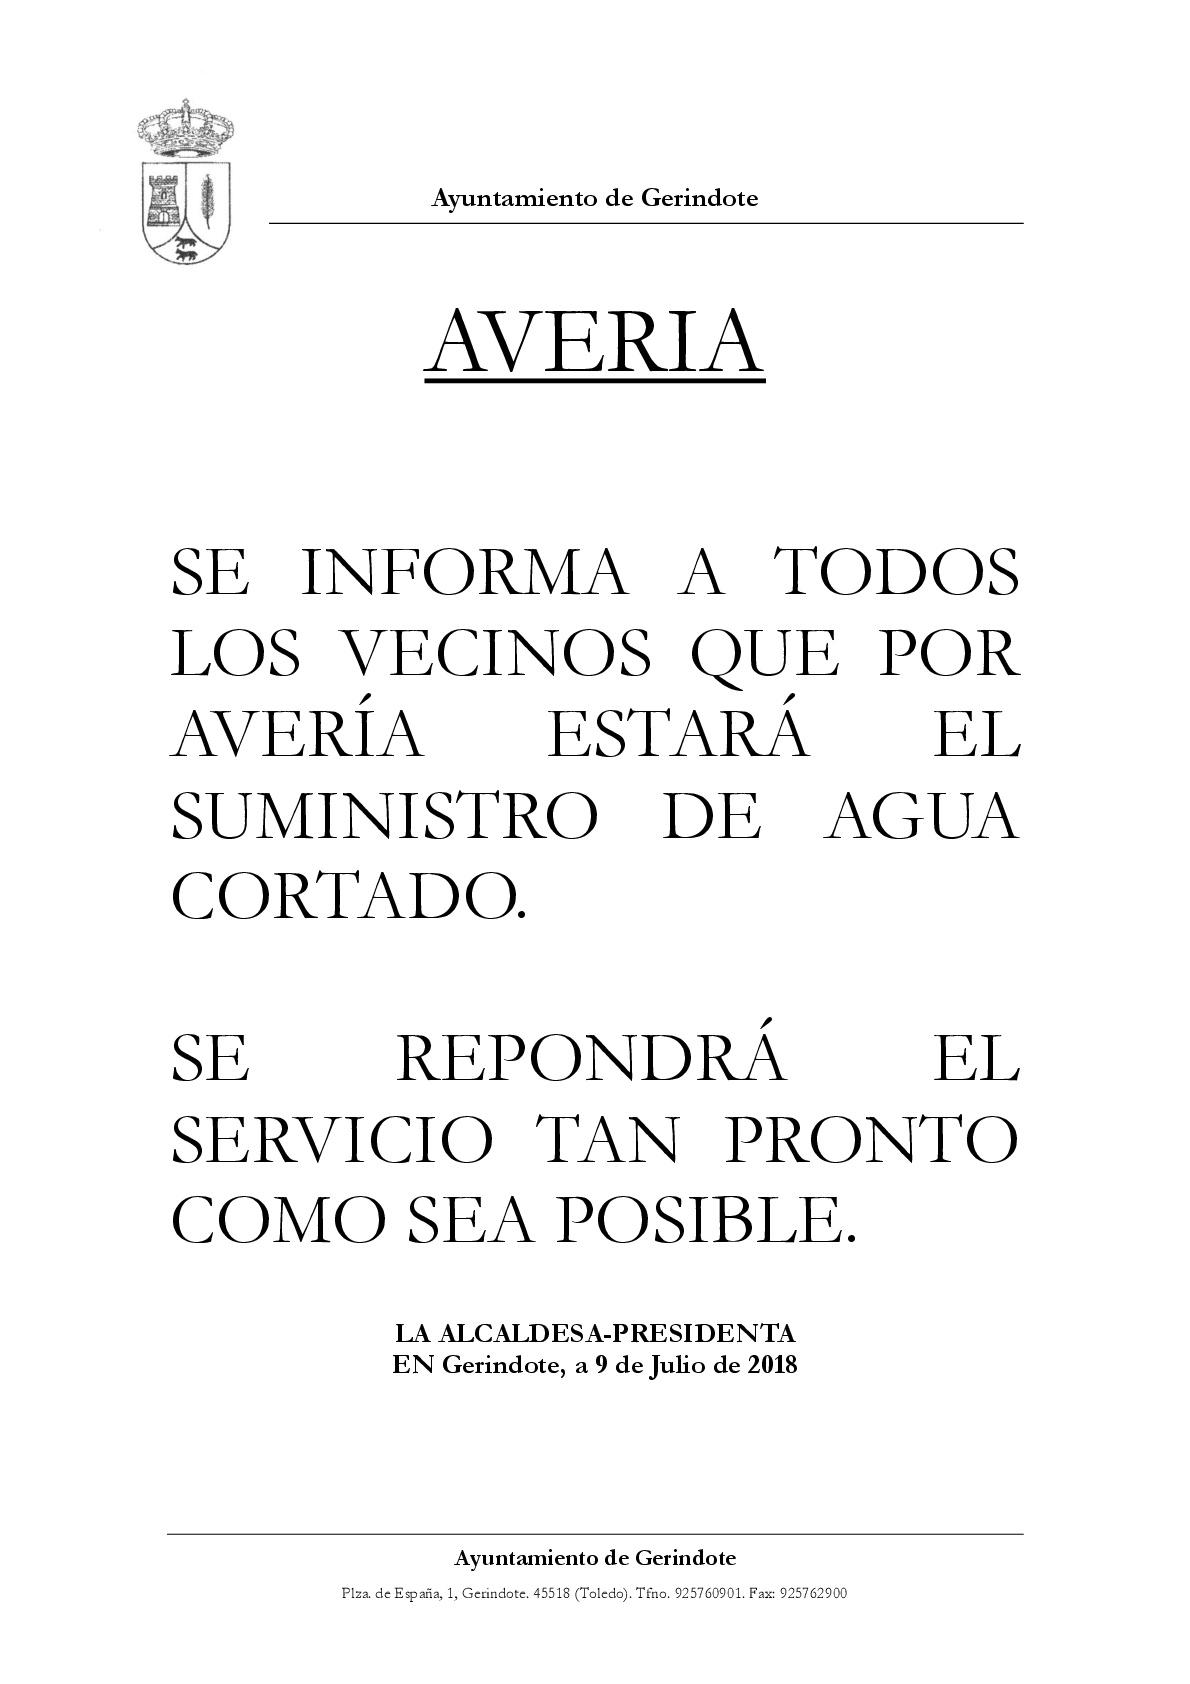 AVERIA-001.jpg